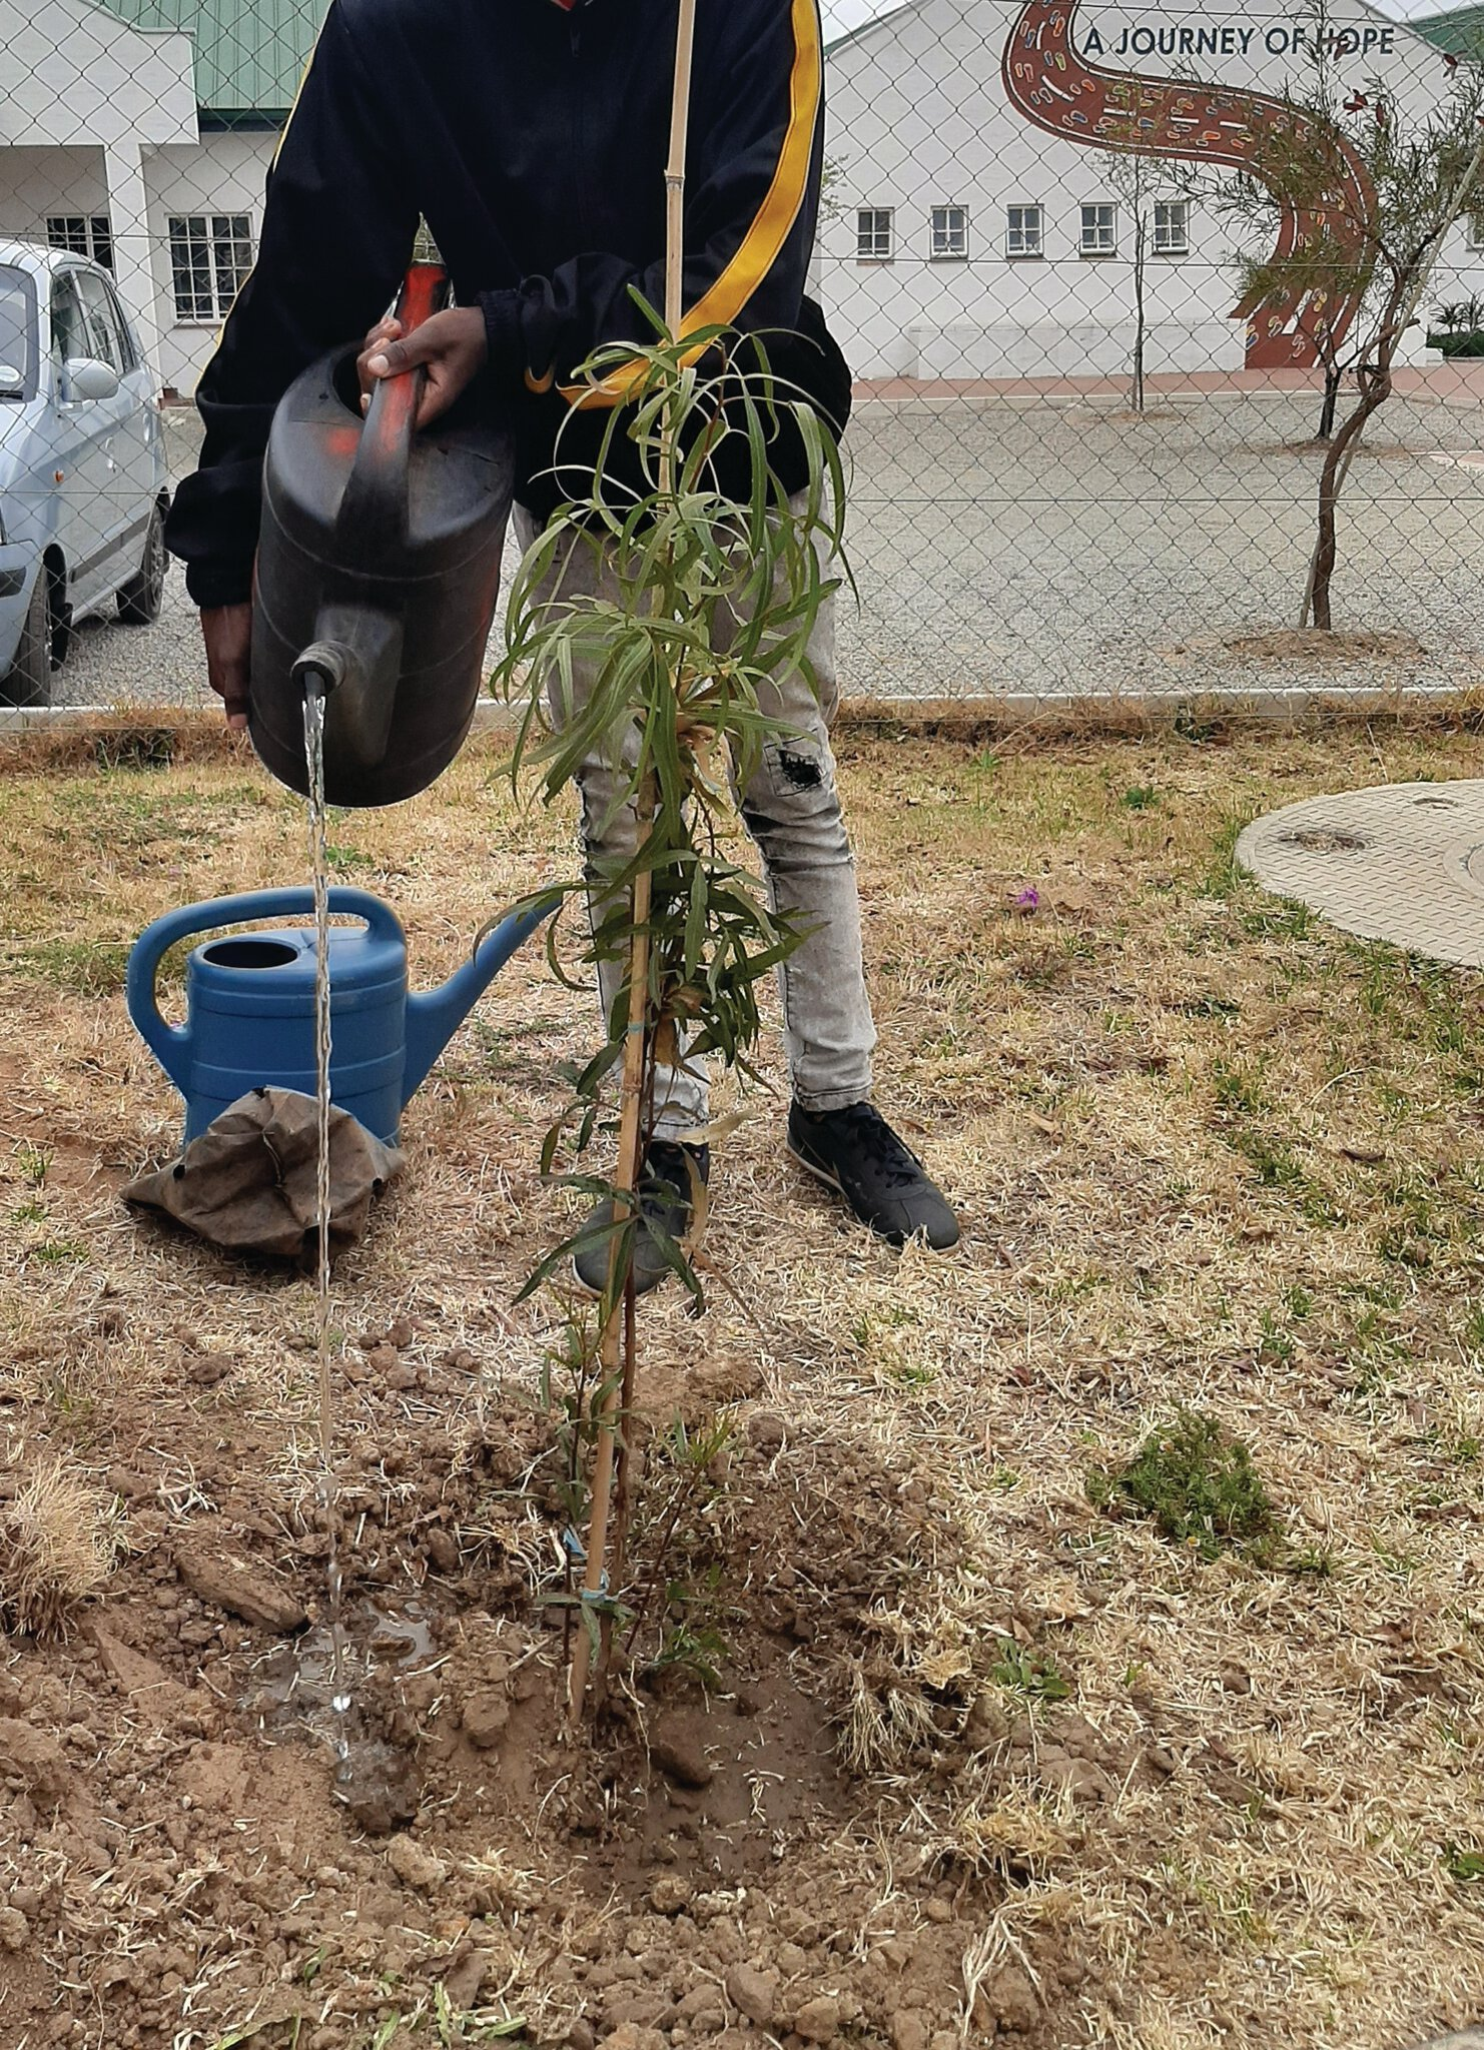 NOKHUPILE tree plant arbor day Sep 2020 two